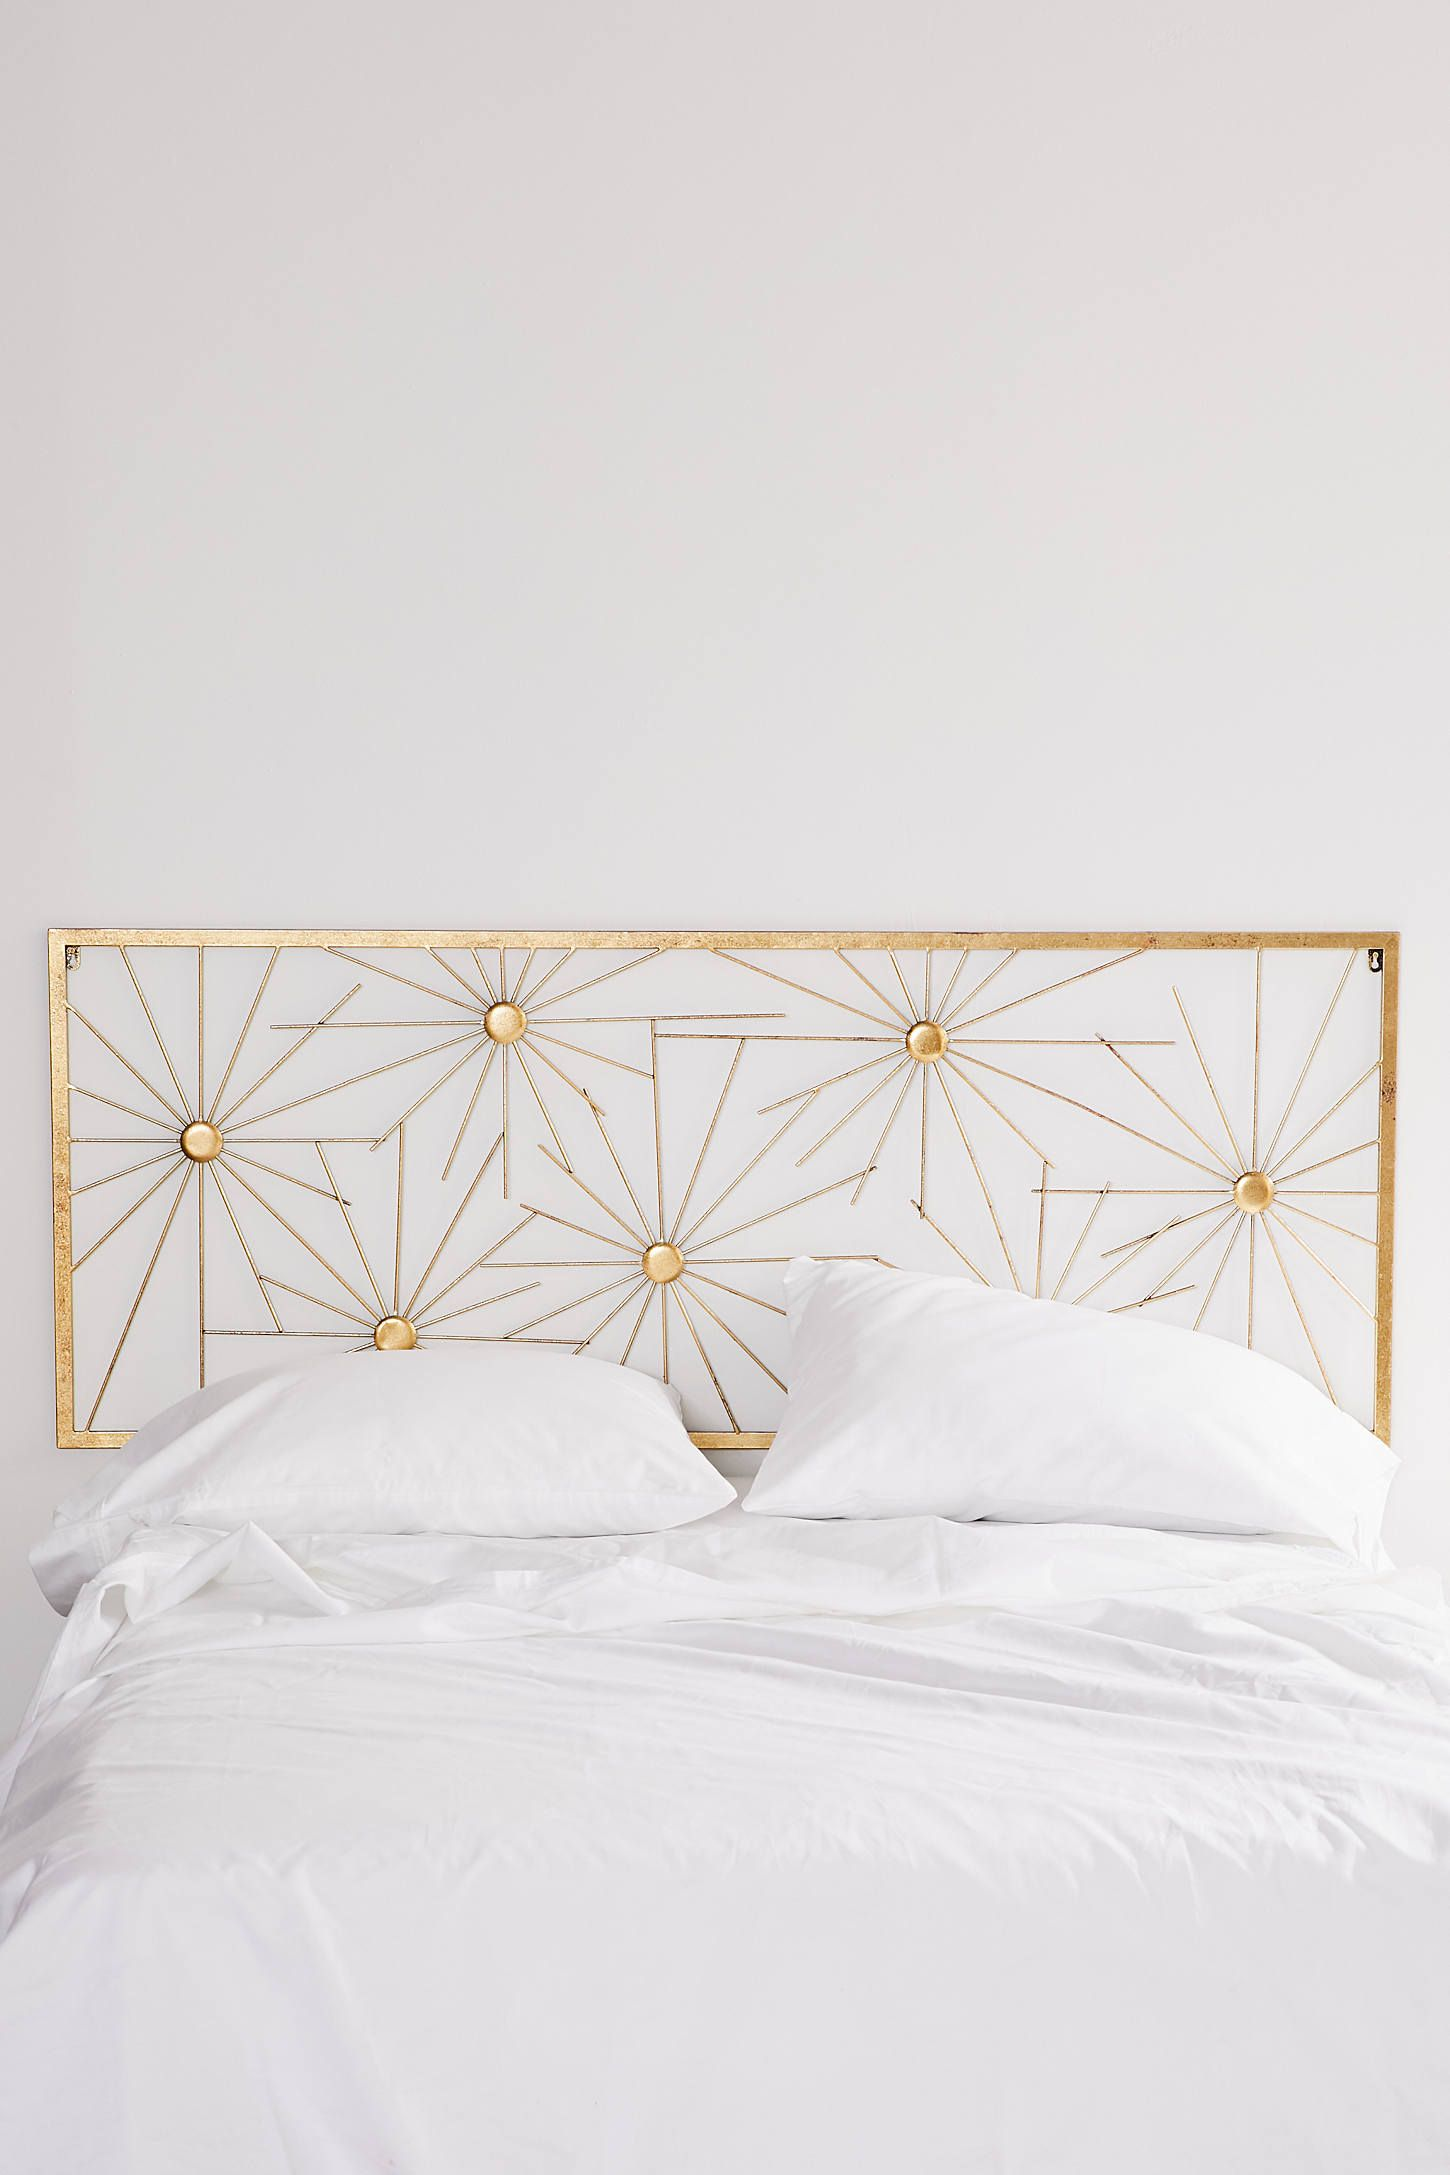 Metal Sunburst Headboard Headboard Decor Metal Headboard Gold Bed Frame